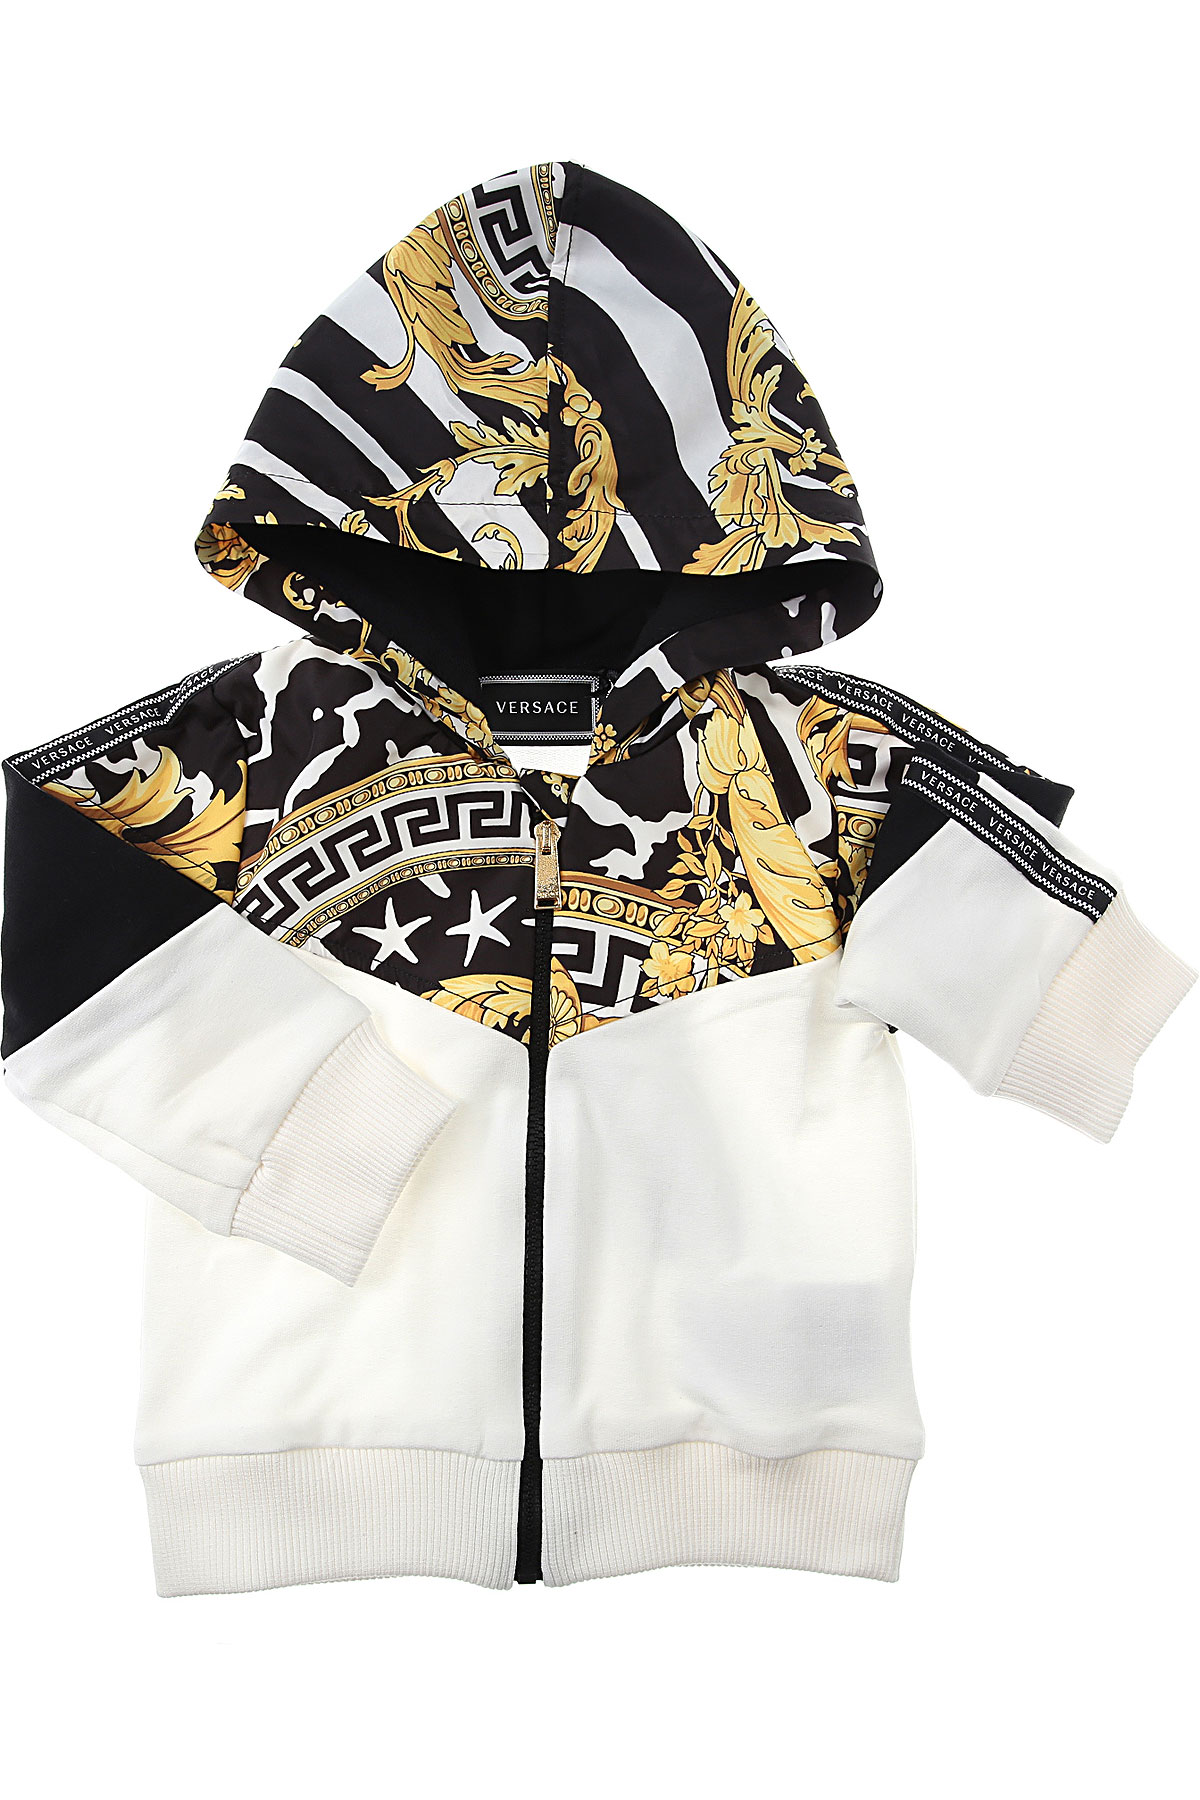 Versace Baby Sweatshirts & Hoodies for Boys On Sale, Black, Cotton, 2019, 12 M 18M 2Y 3M 6M 9M